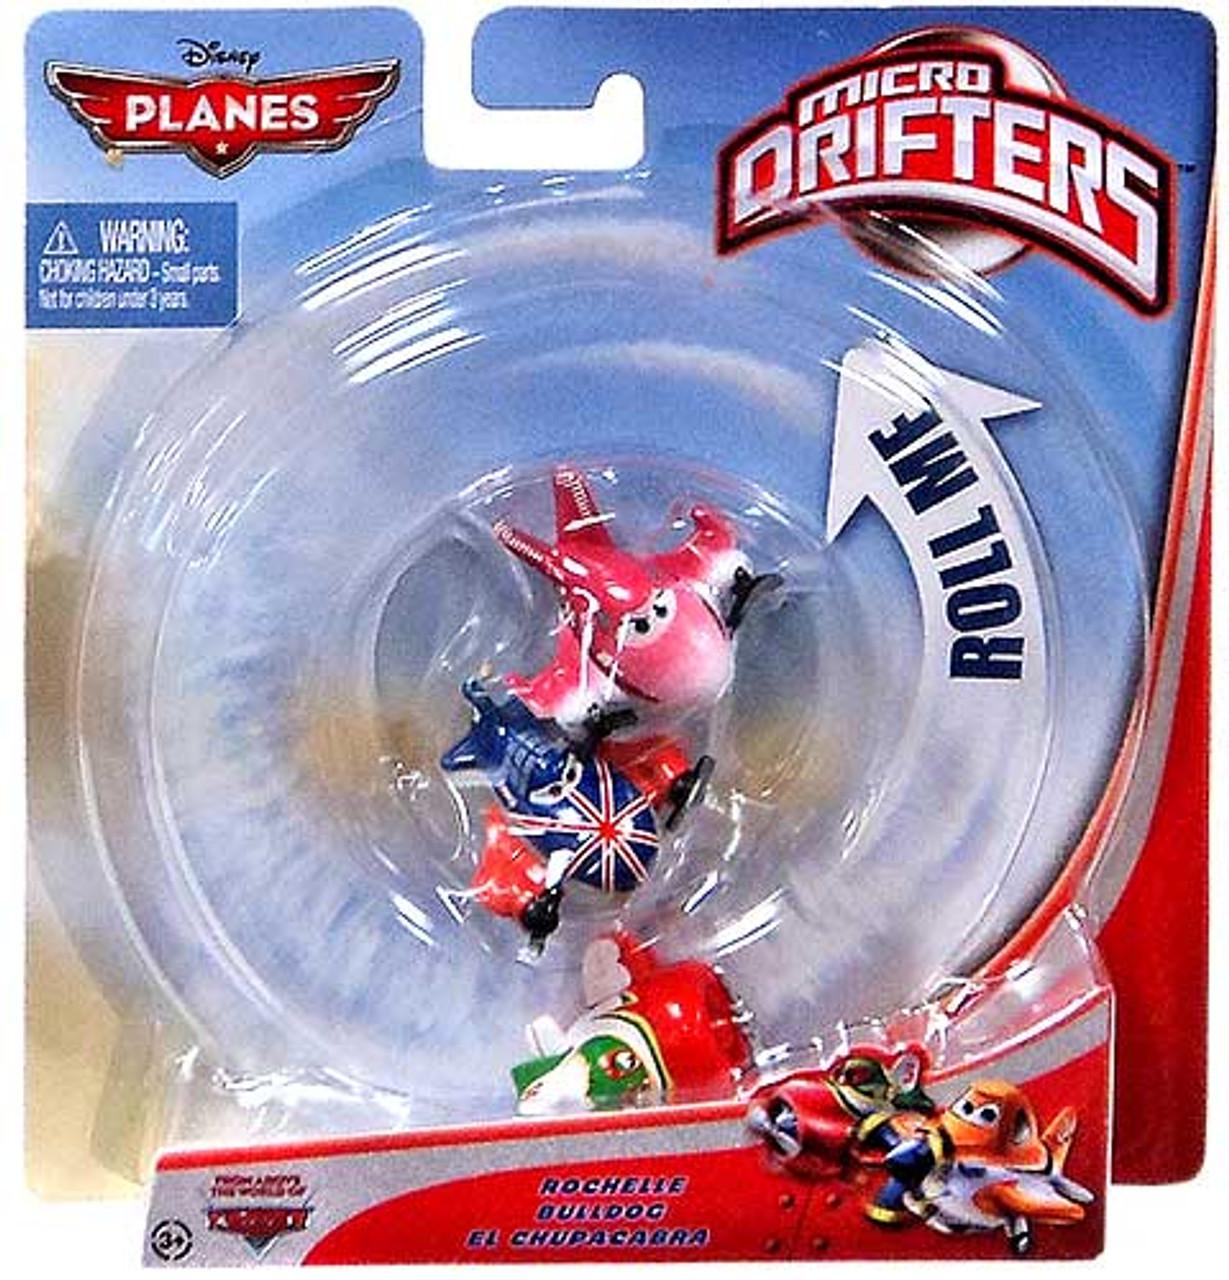 Disney Planes Micro Drifters Rochelle, Bulldog & El Chupacabra Vehicle 3-Pack